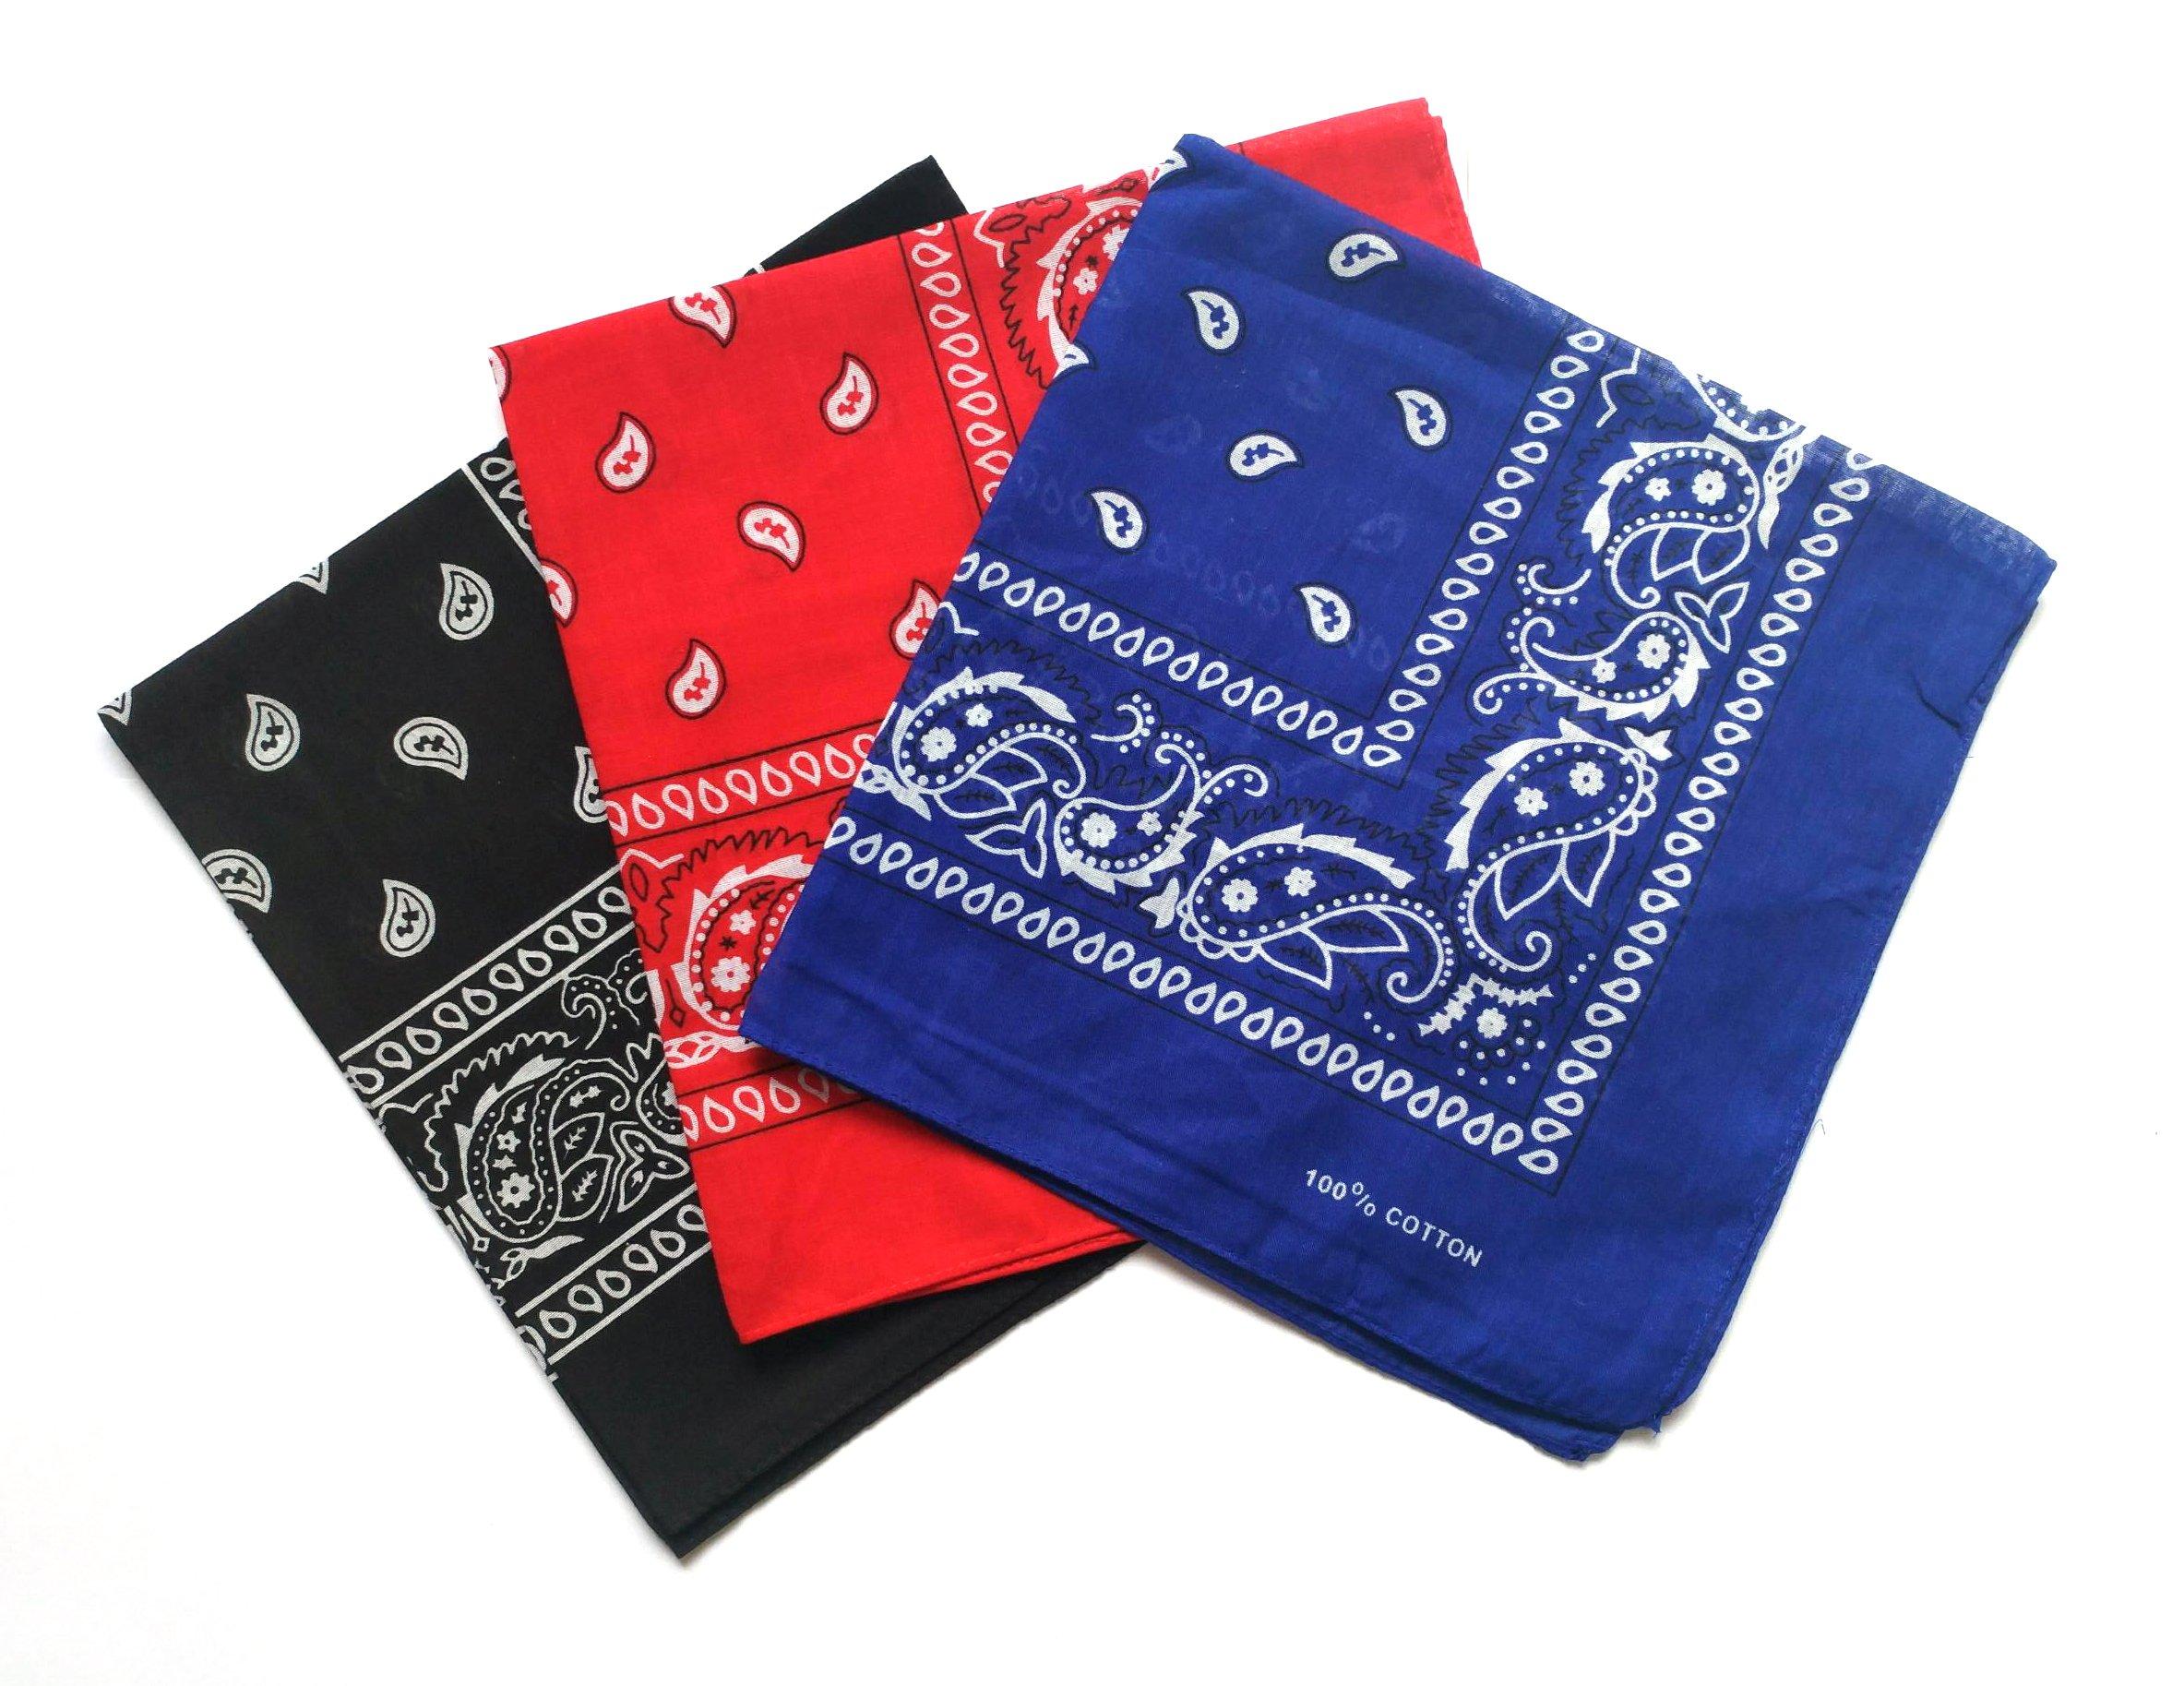 ComboCube 12 Pack Multi-Purpose Cotton Paisley Cowboy Bandanas Headband for Men and Women,Black&Blue&Red